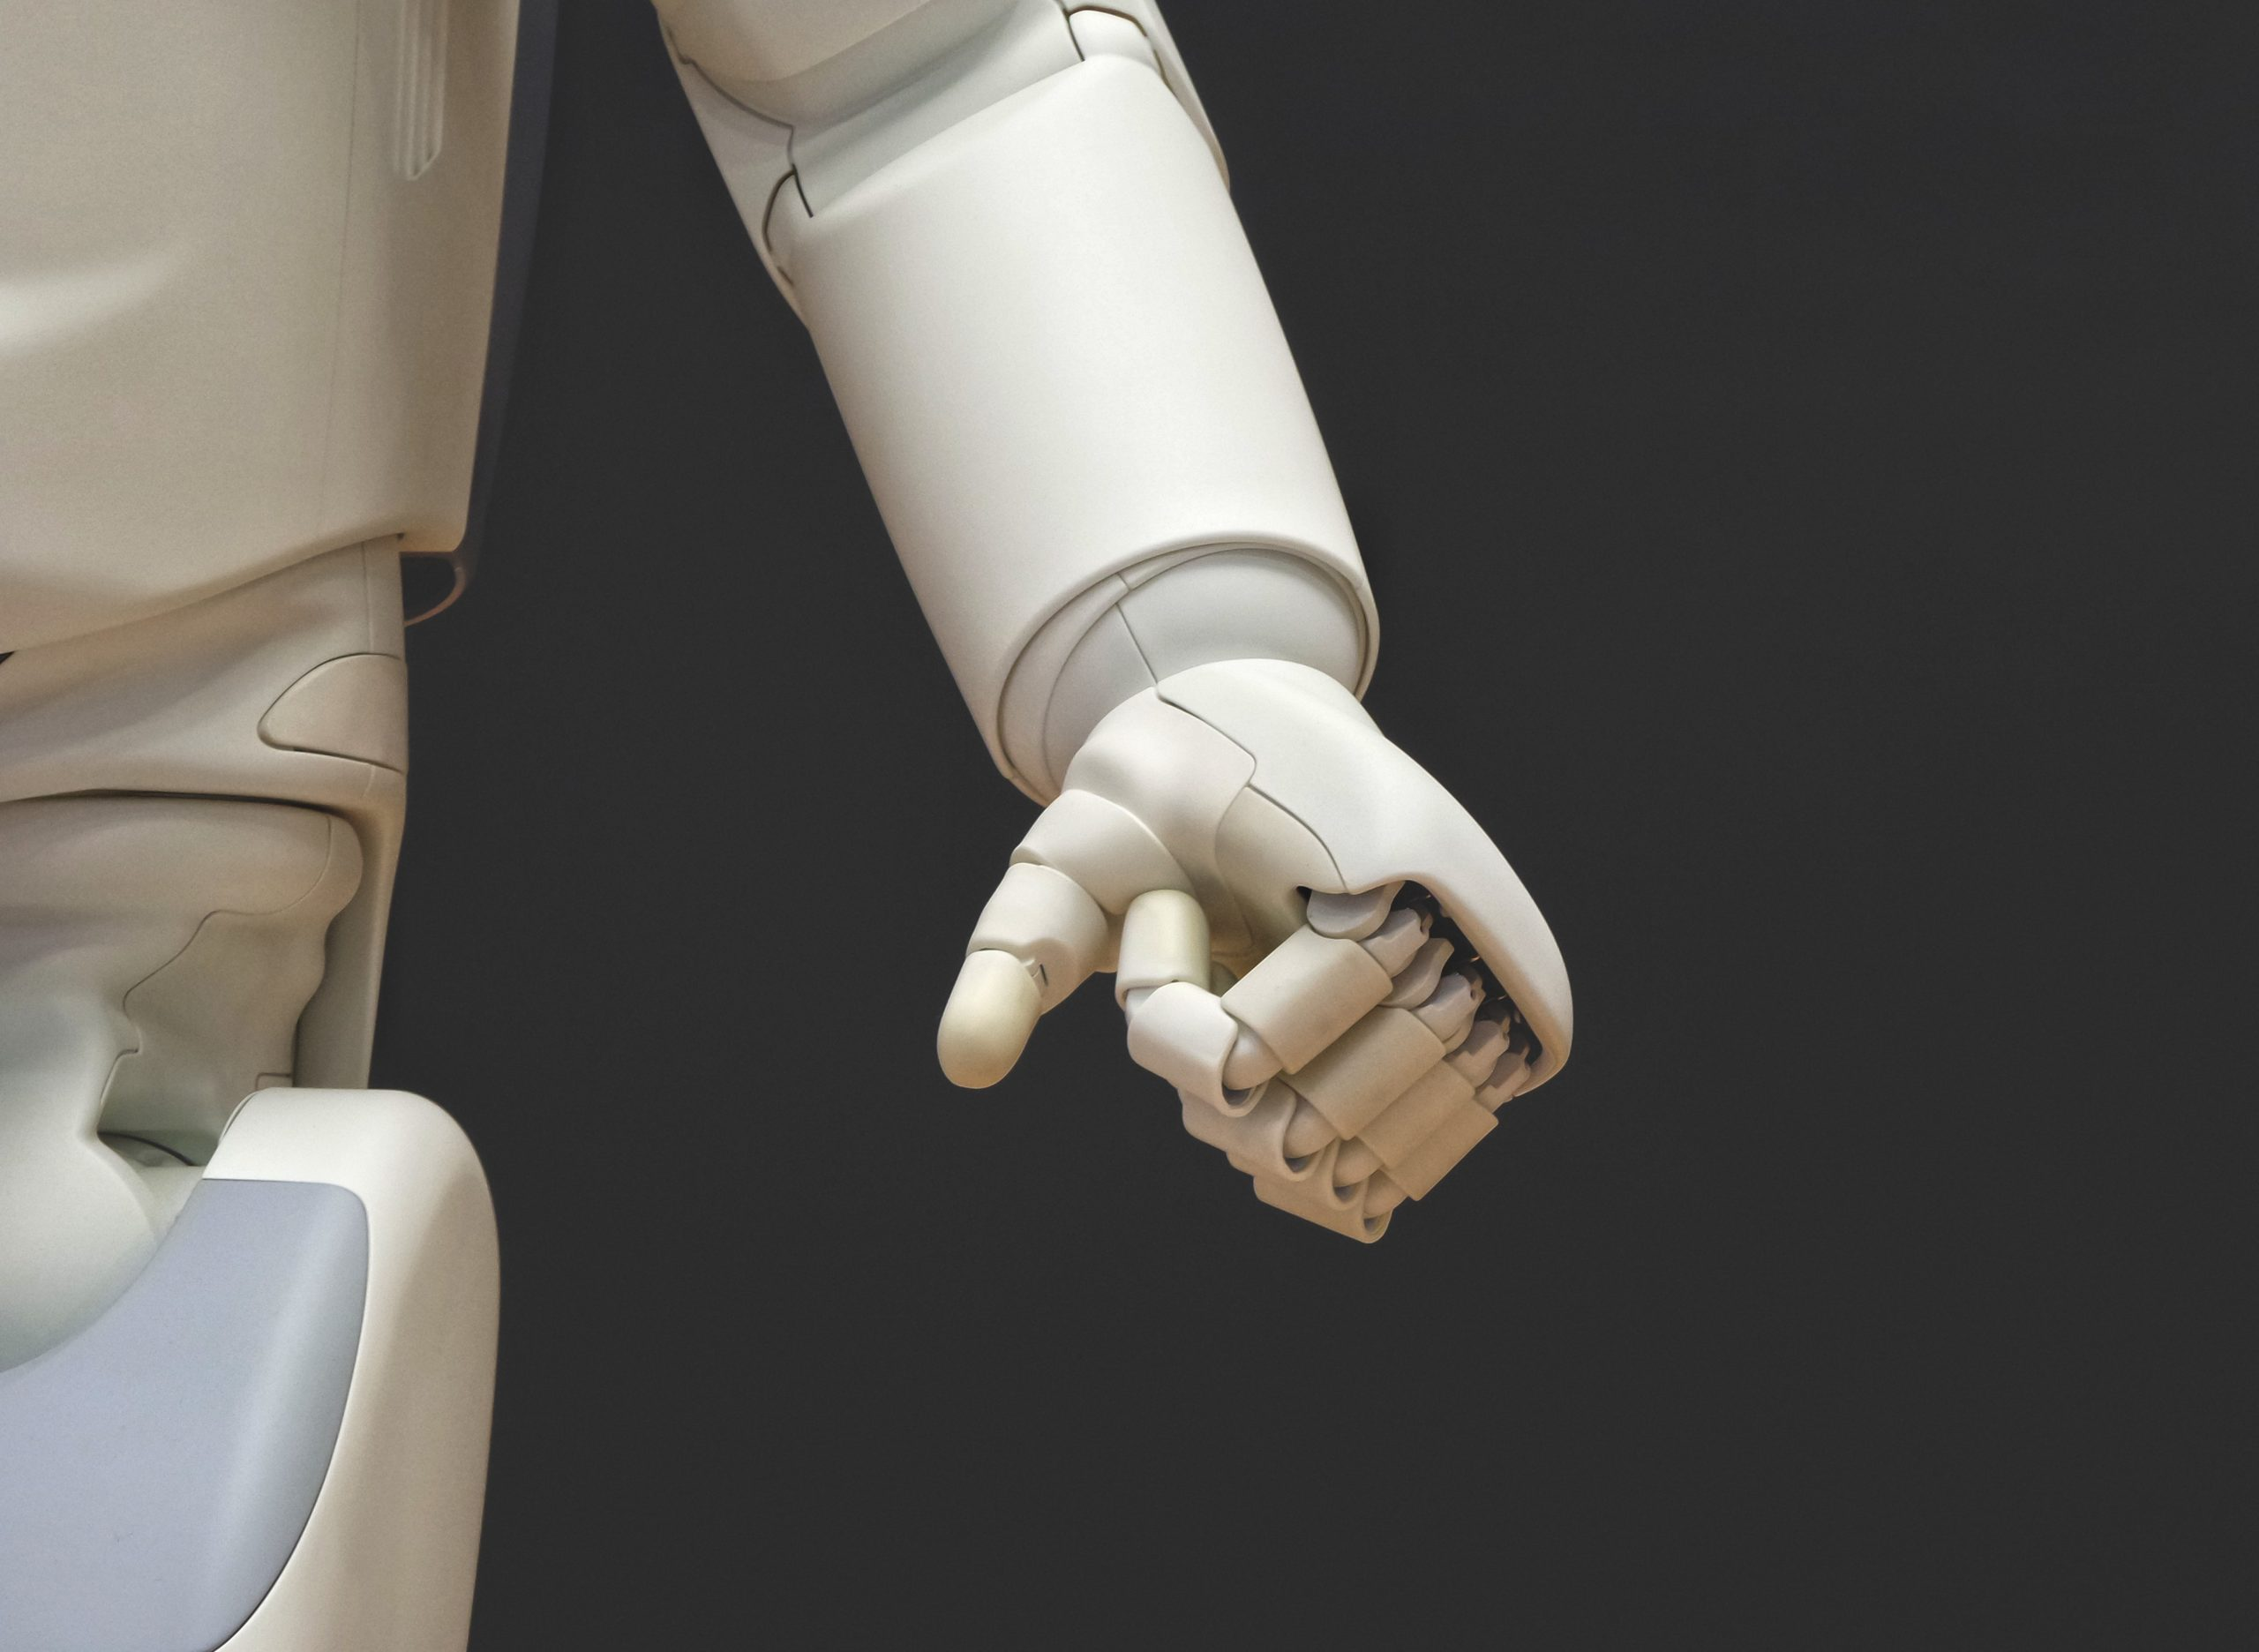 La barbarie du projet transhumaniste